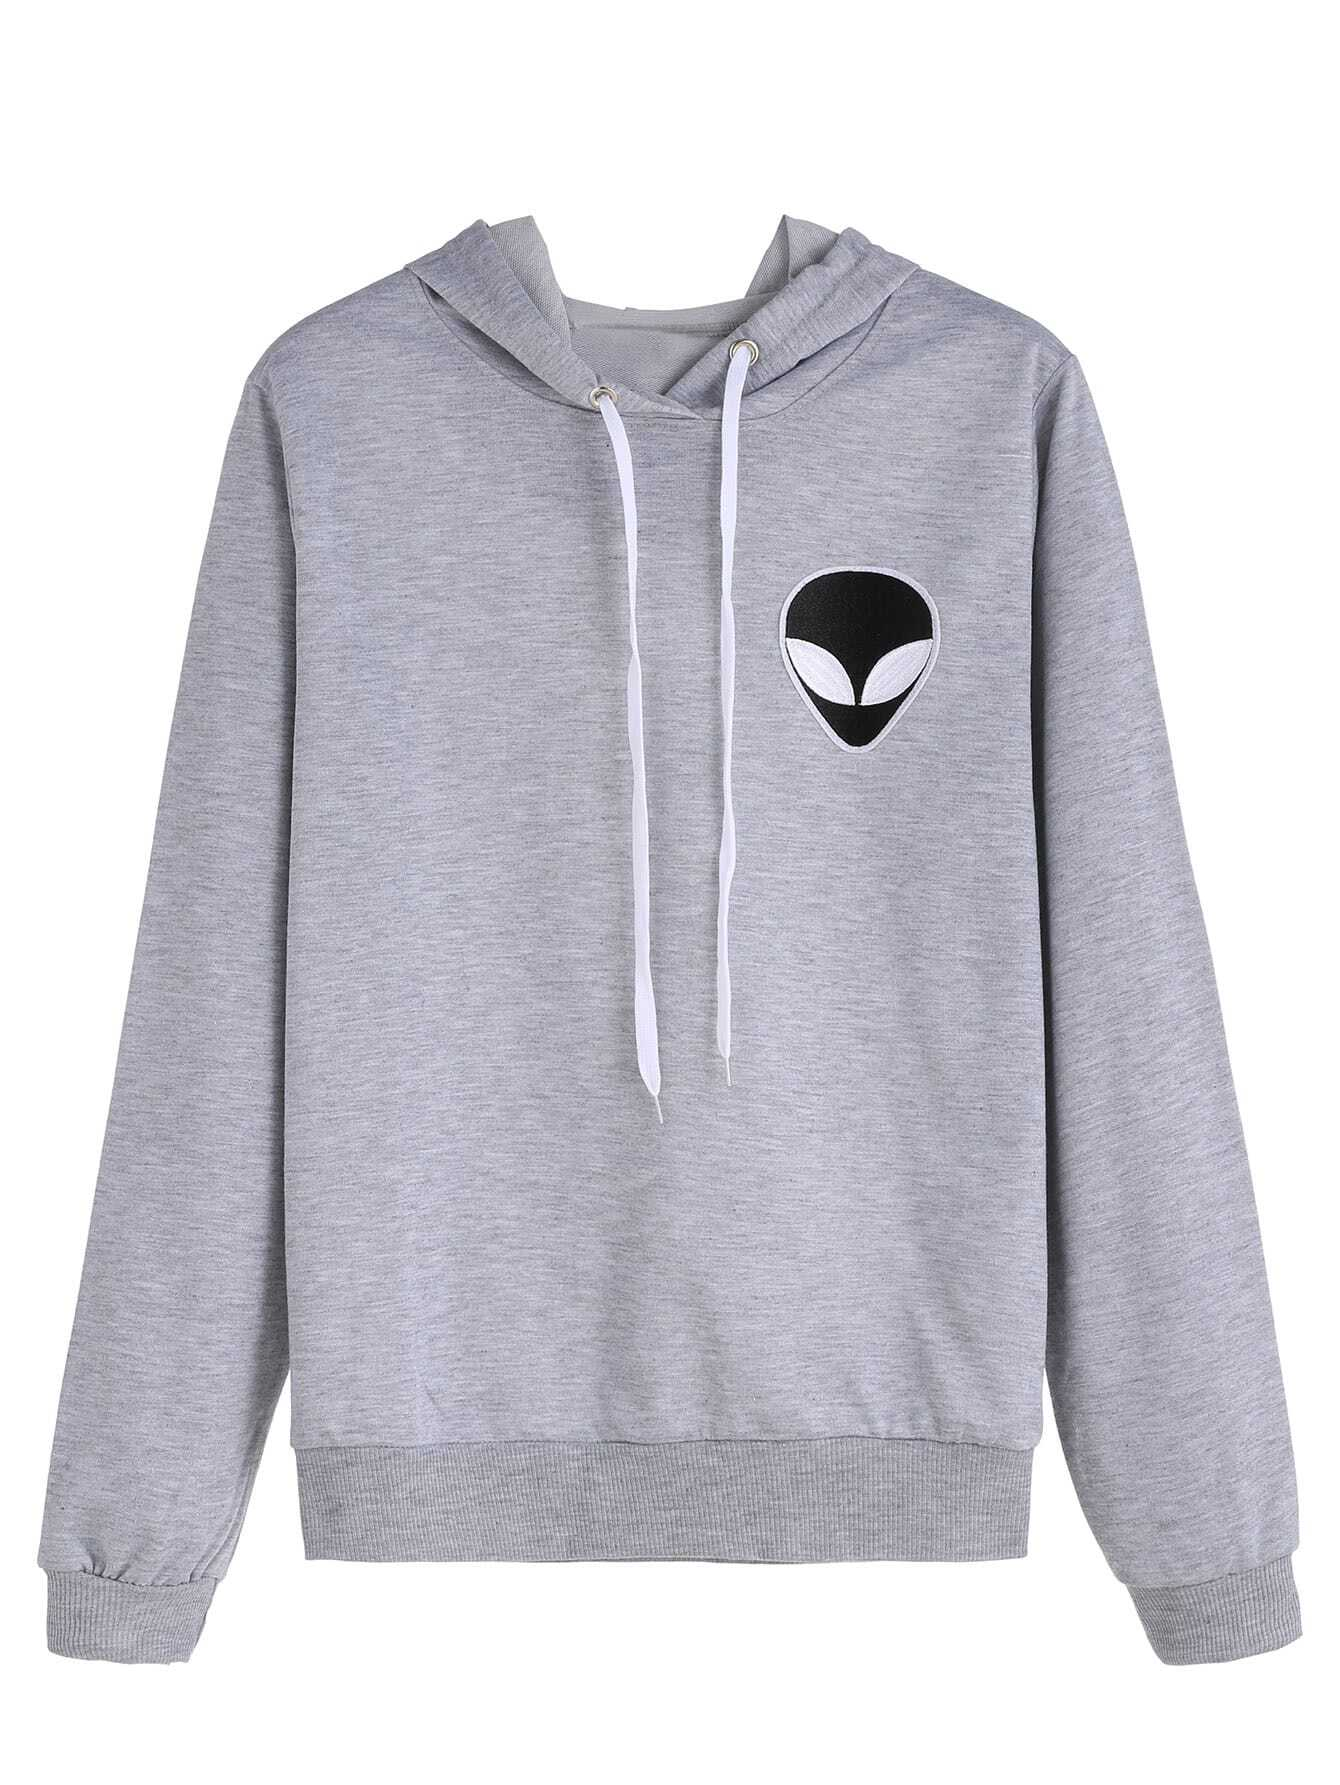 Grey Alien Embroidered Hooded Sweatshirt